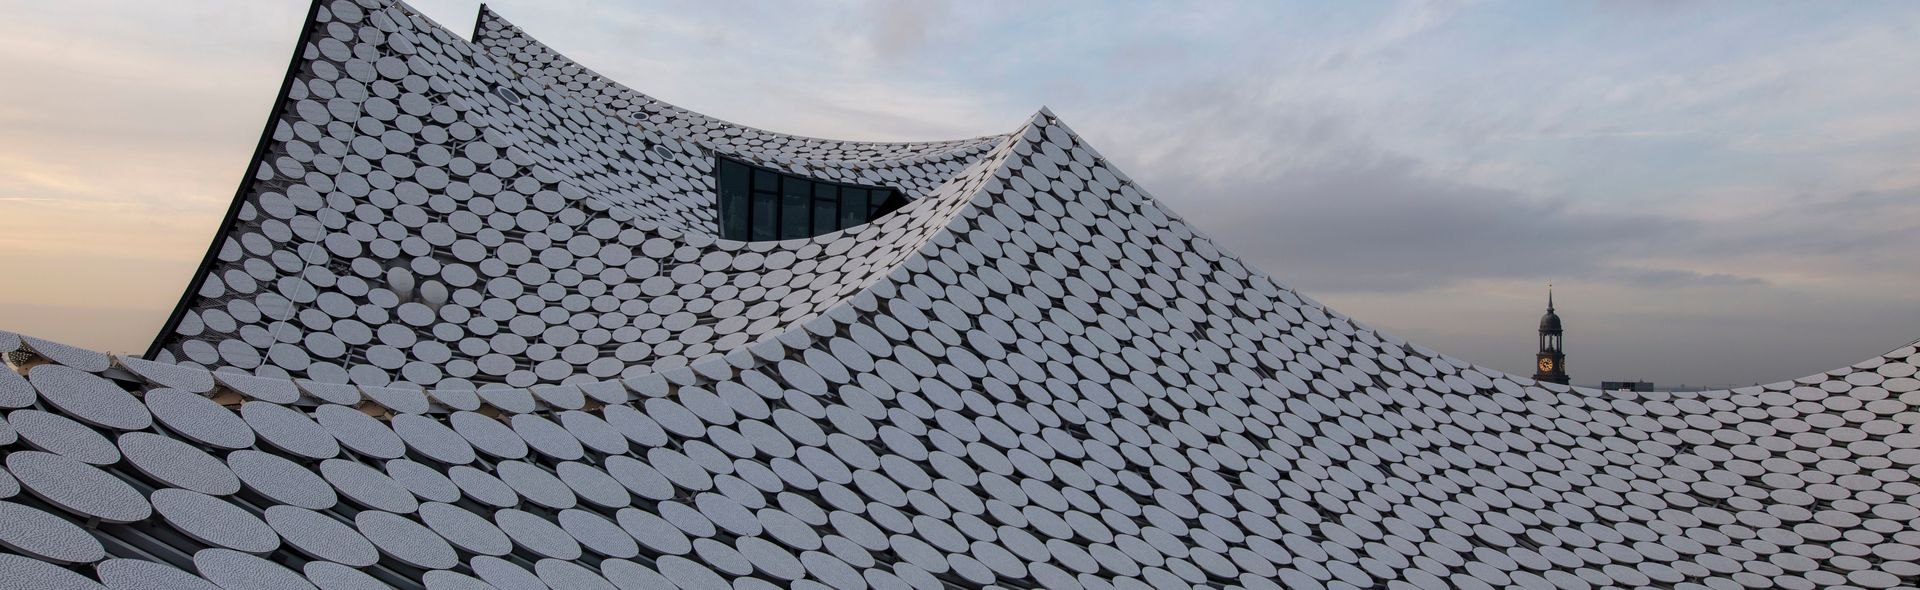 Roof-PIN auf Elbphilharmonie Dach